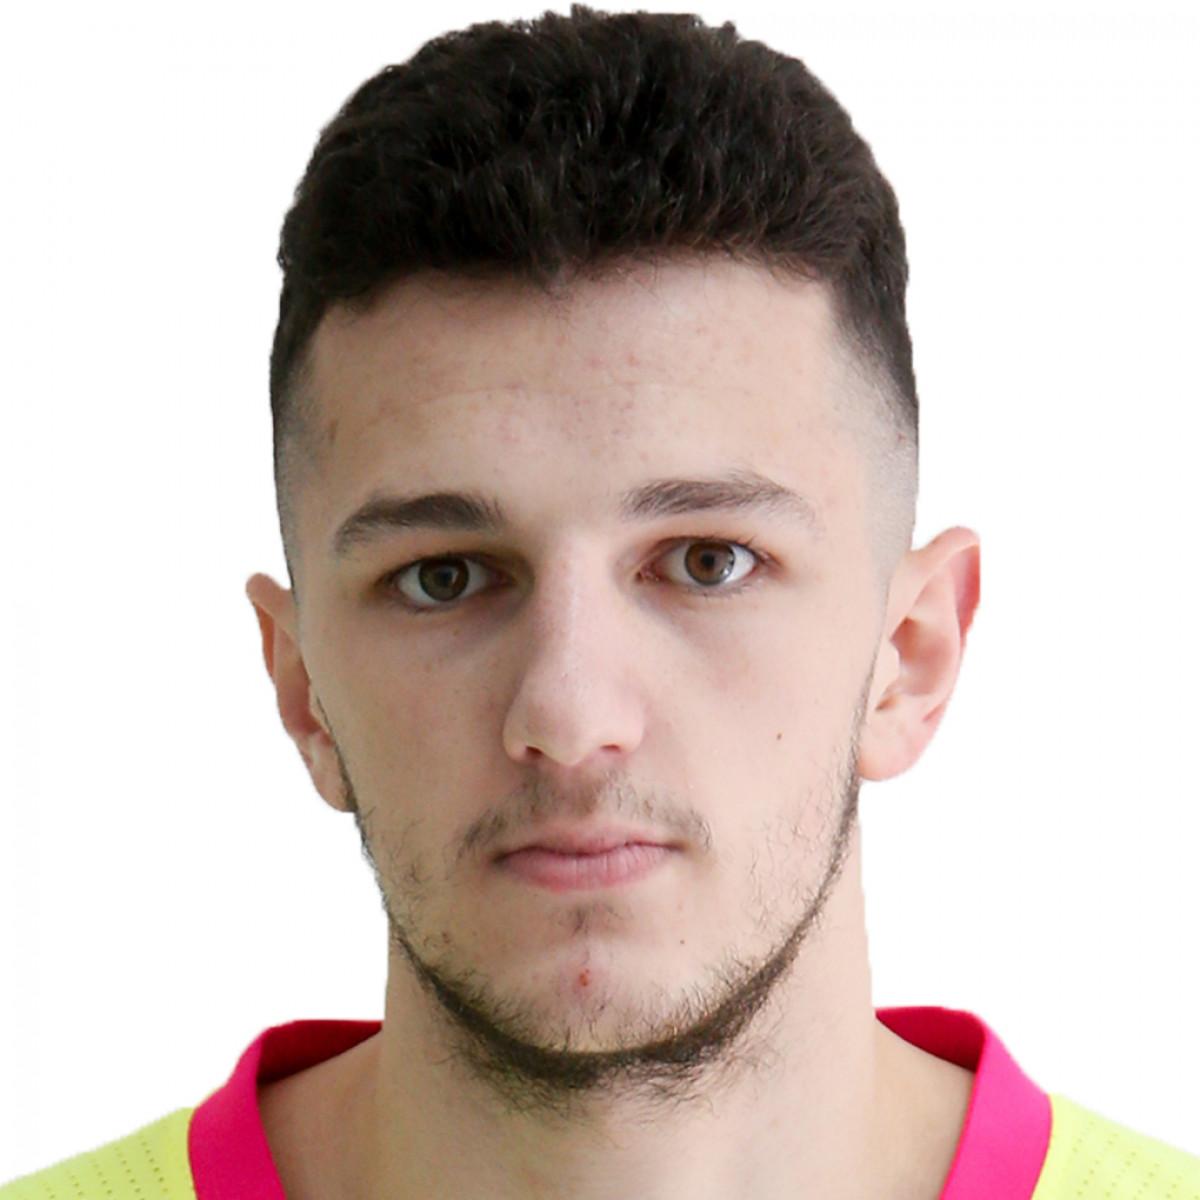 Karlo Matkovic